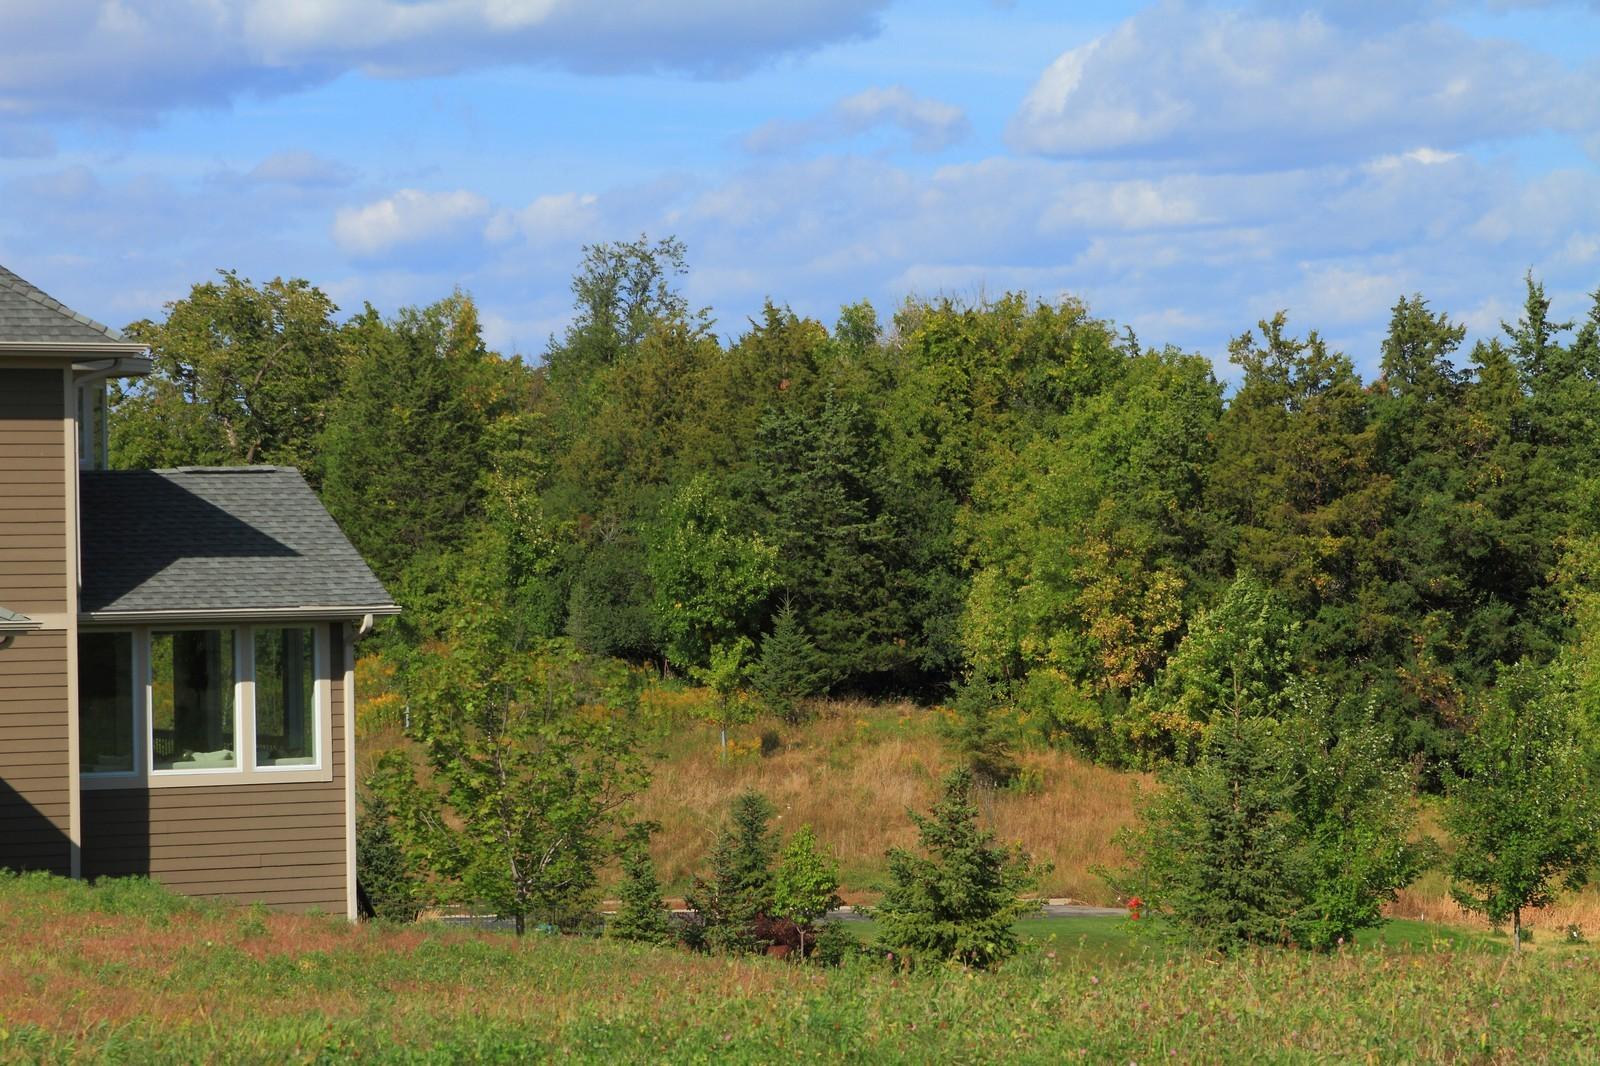 Real Estate Photography - 9627 Sky Lane, Eden Prairie, MN, 55347 - Location 4